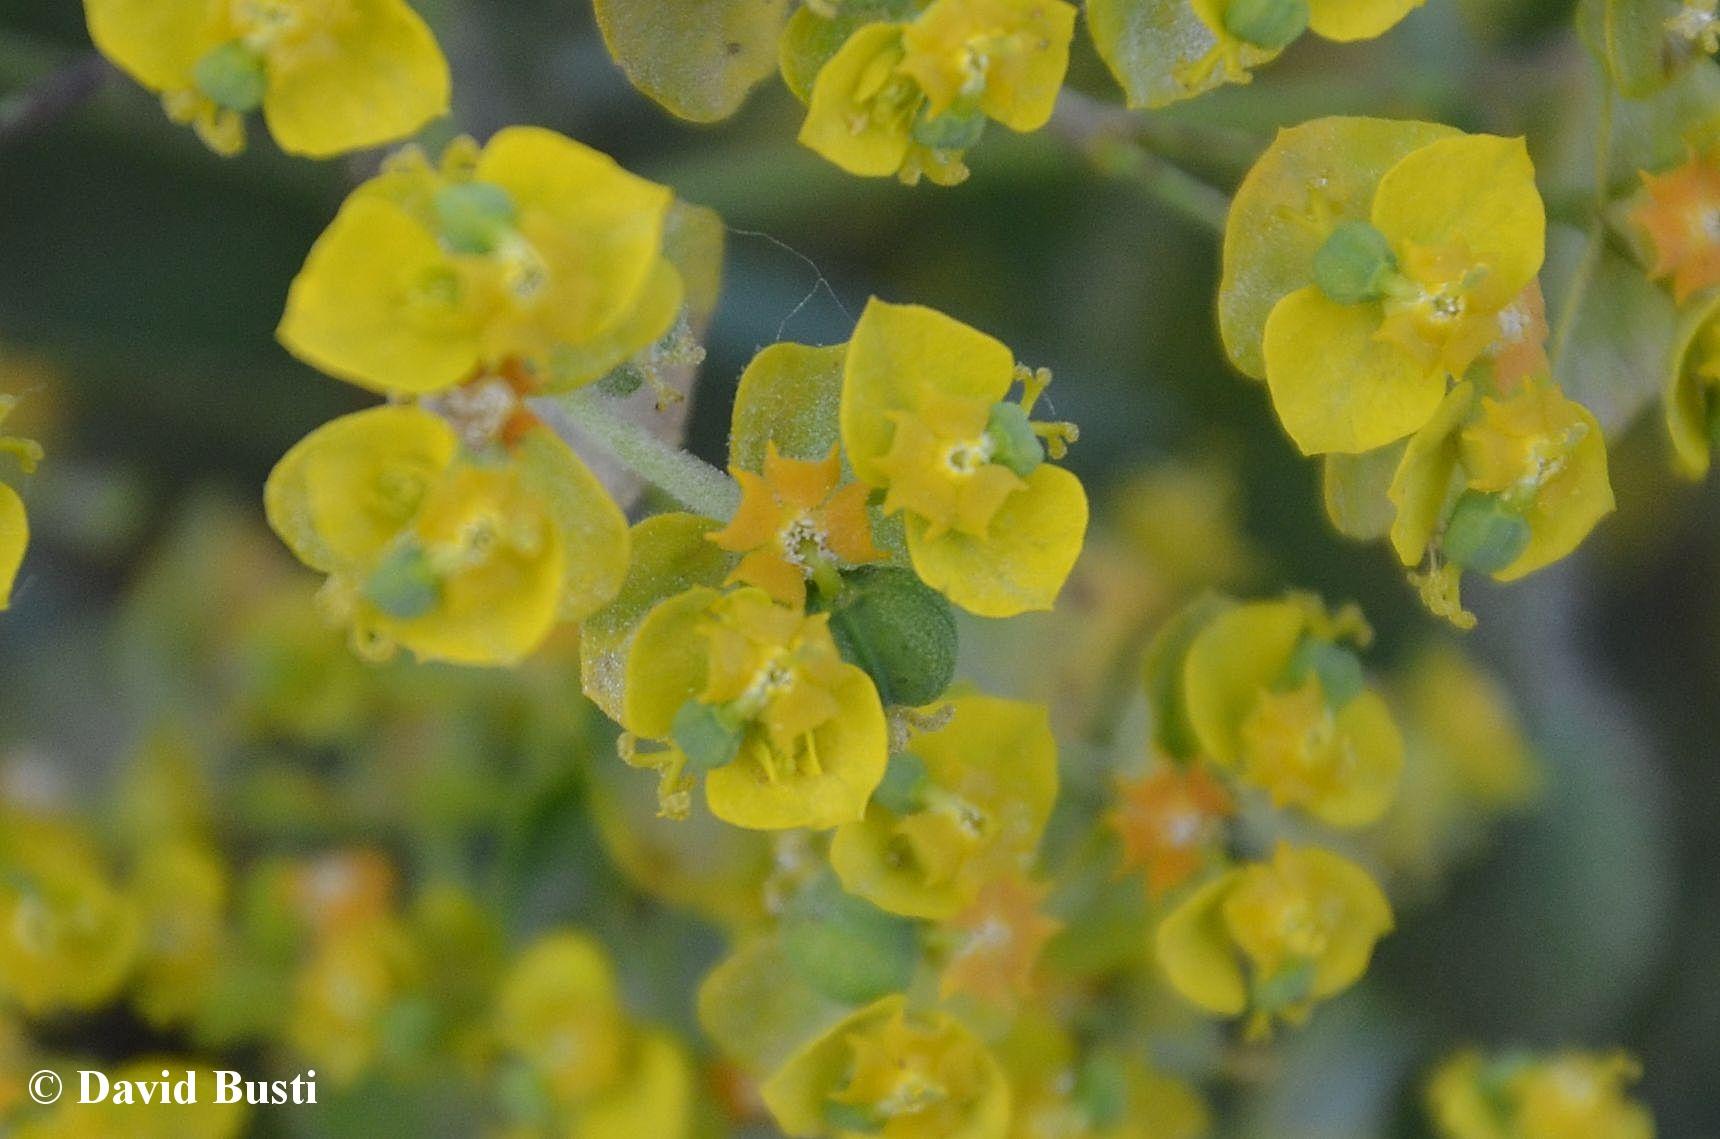 Euphorbia_cyparissias-cyathium.JPG